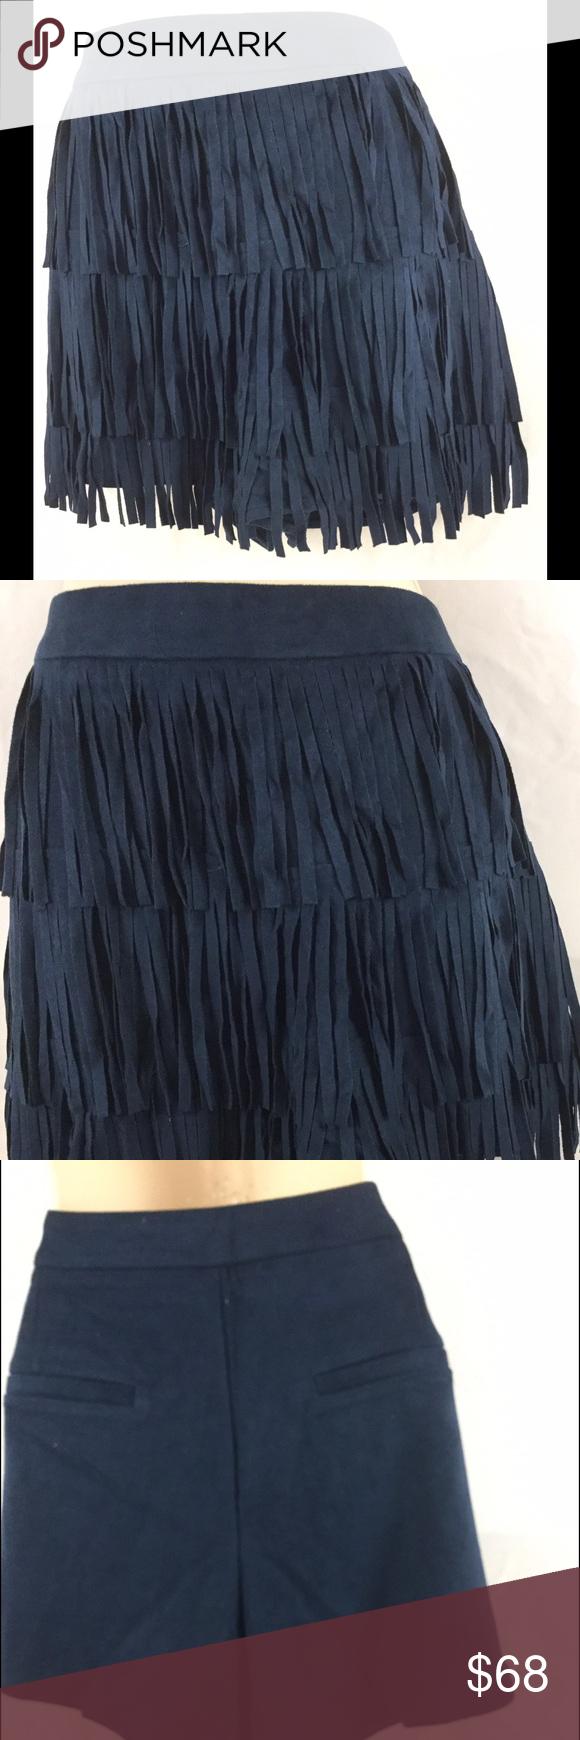 Selling this New Blu pepper suede shorts on Poshmark! My username is: kennjenn2010. #shopmycloset #poshmark #fashion #shopping #style #forsale #Blu Pepper #Dresses & Skirts